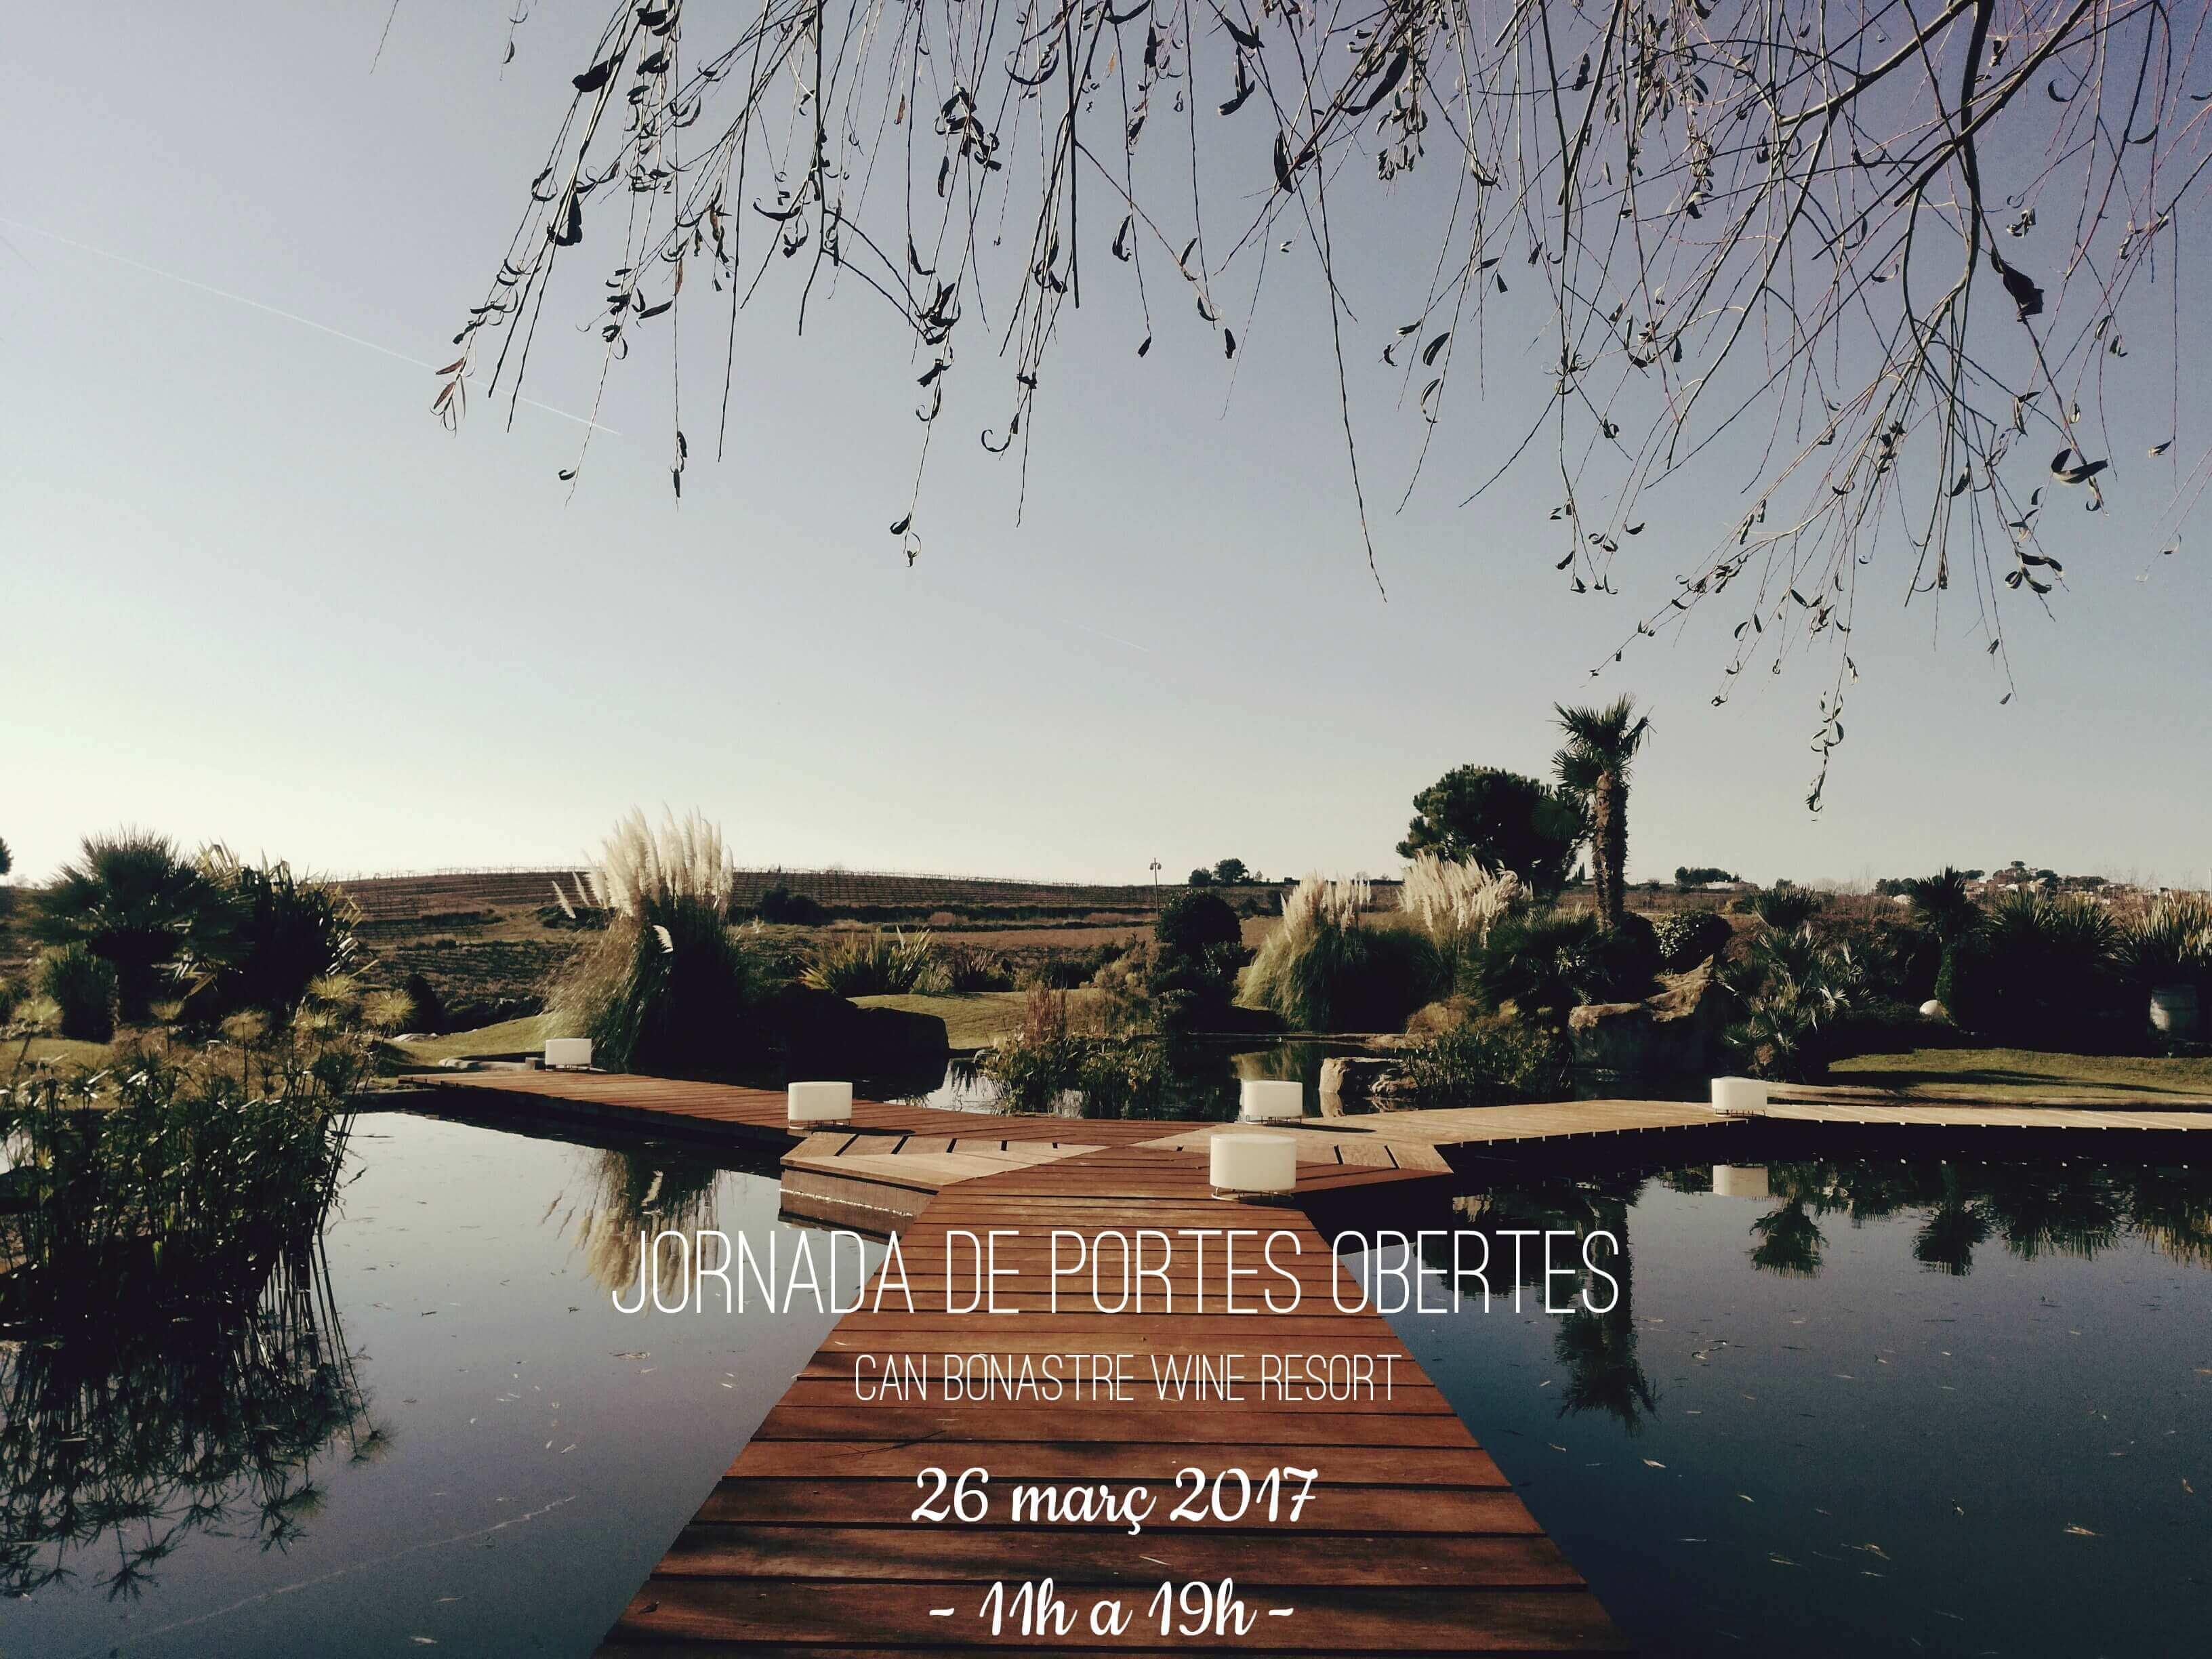 Jornada Abierta Can Bonastre Wine Resort 26 marzo 2017